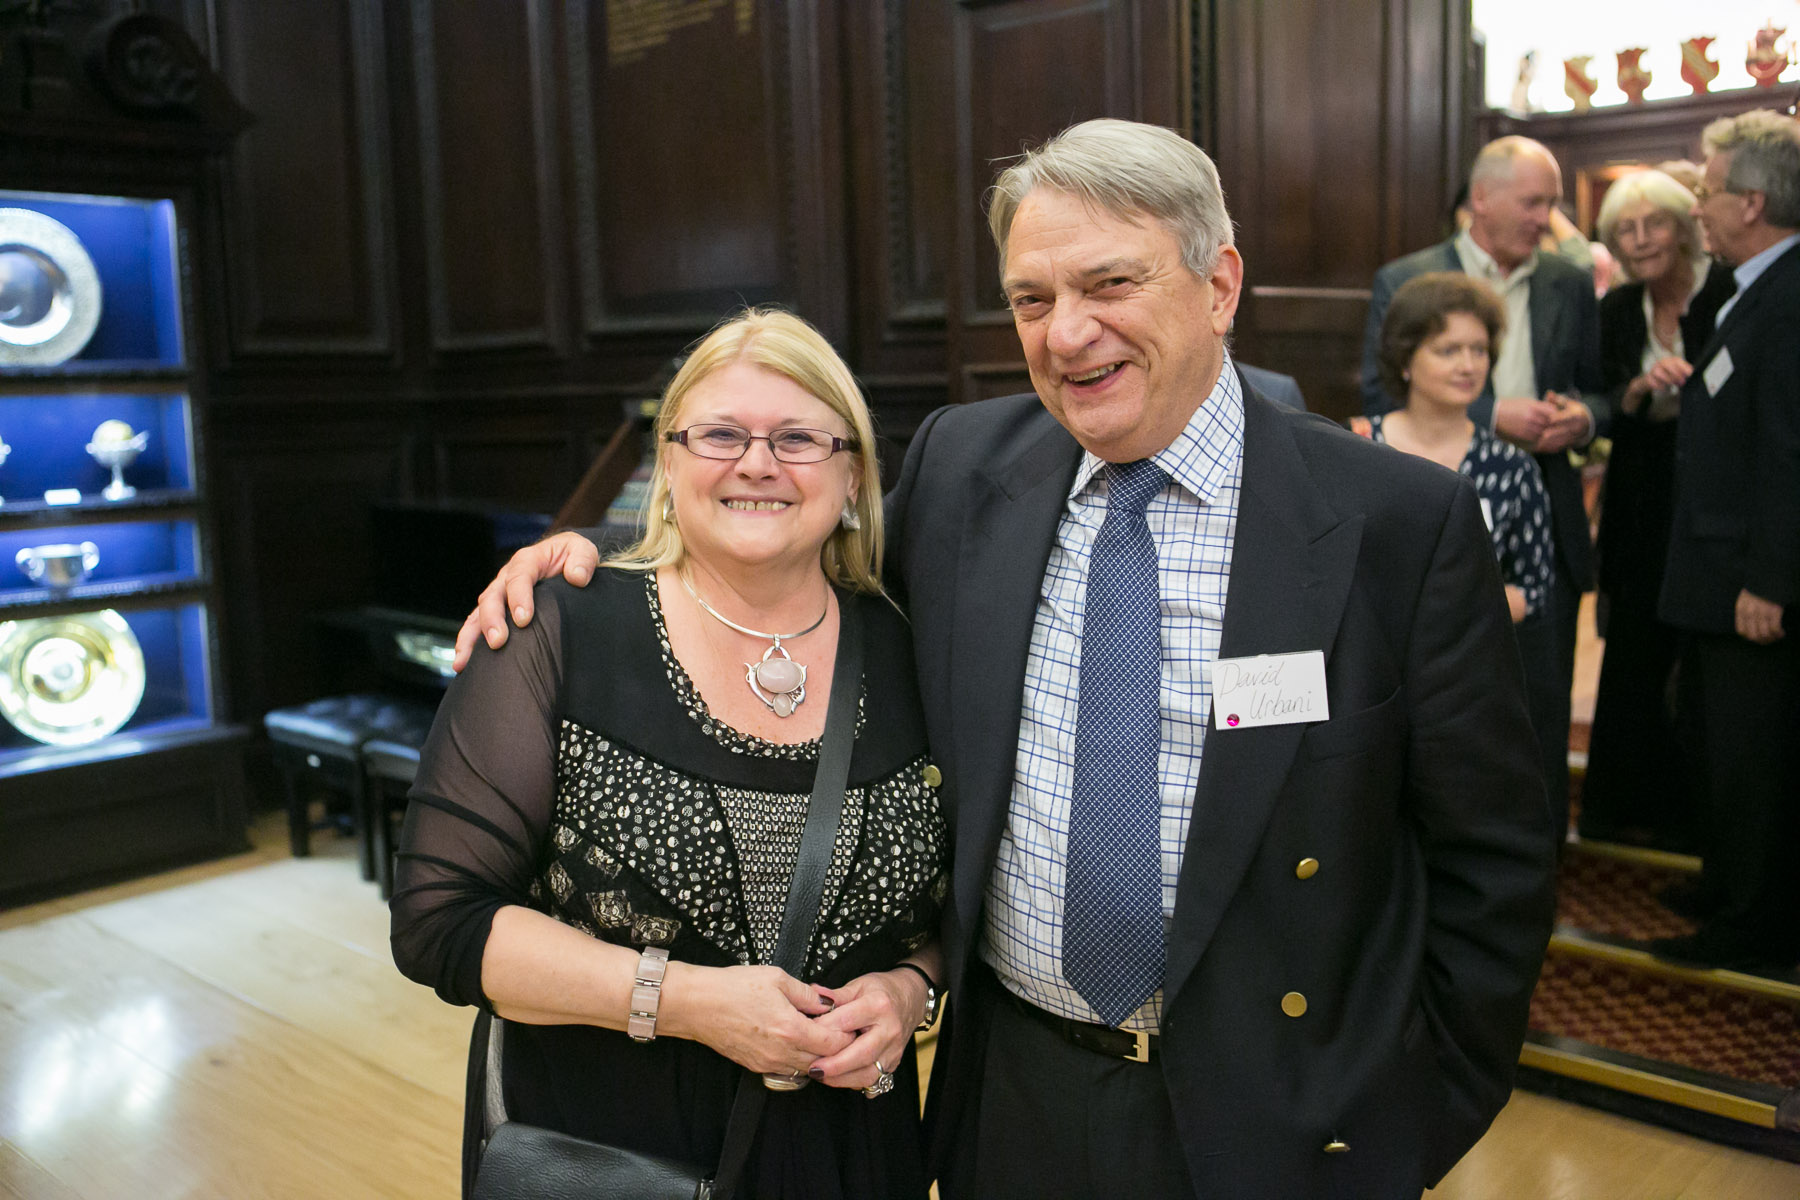 Carole Blake, David Urbani